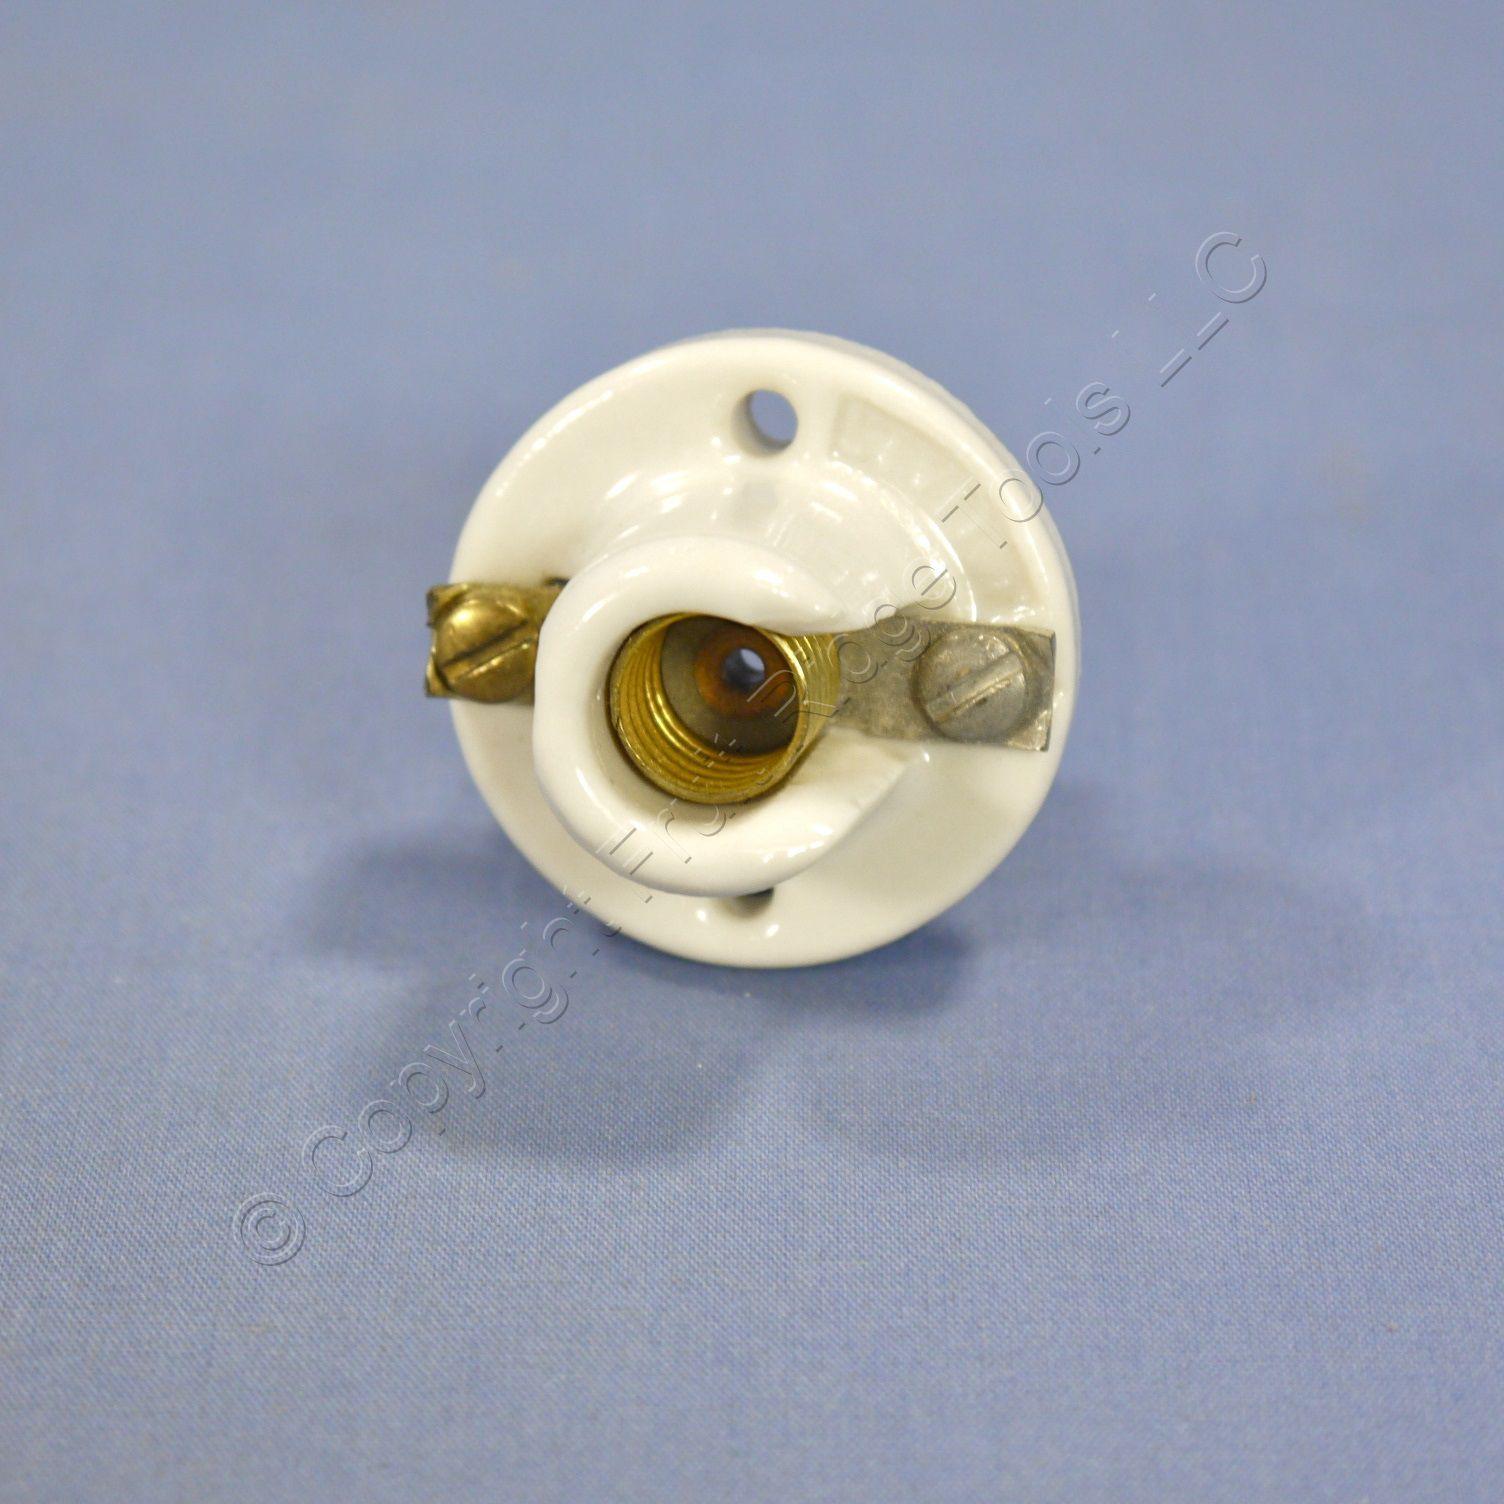 leviton round mini base porcelain lamp holder pony cleat light socket. Black Bedroom Furniture Sets. Home Design Ideas